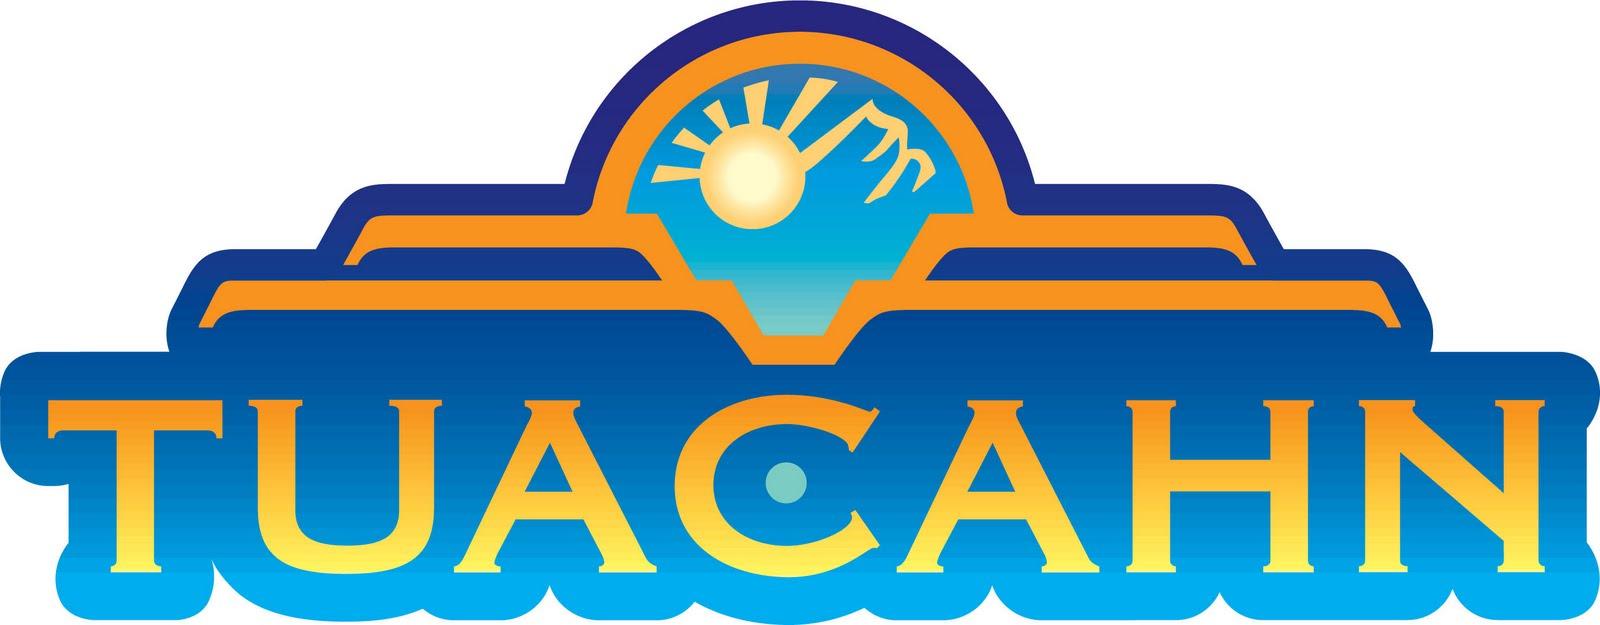 Tuacahn logo